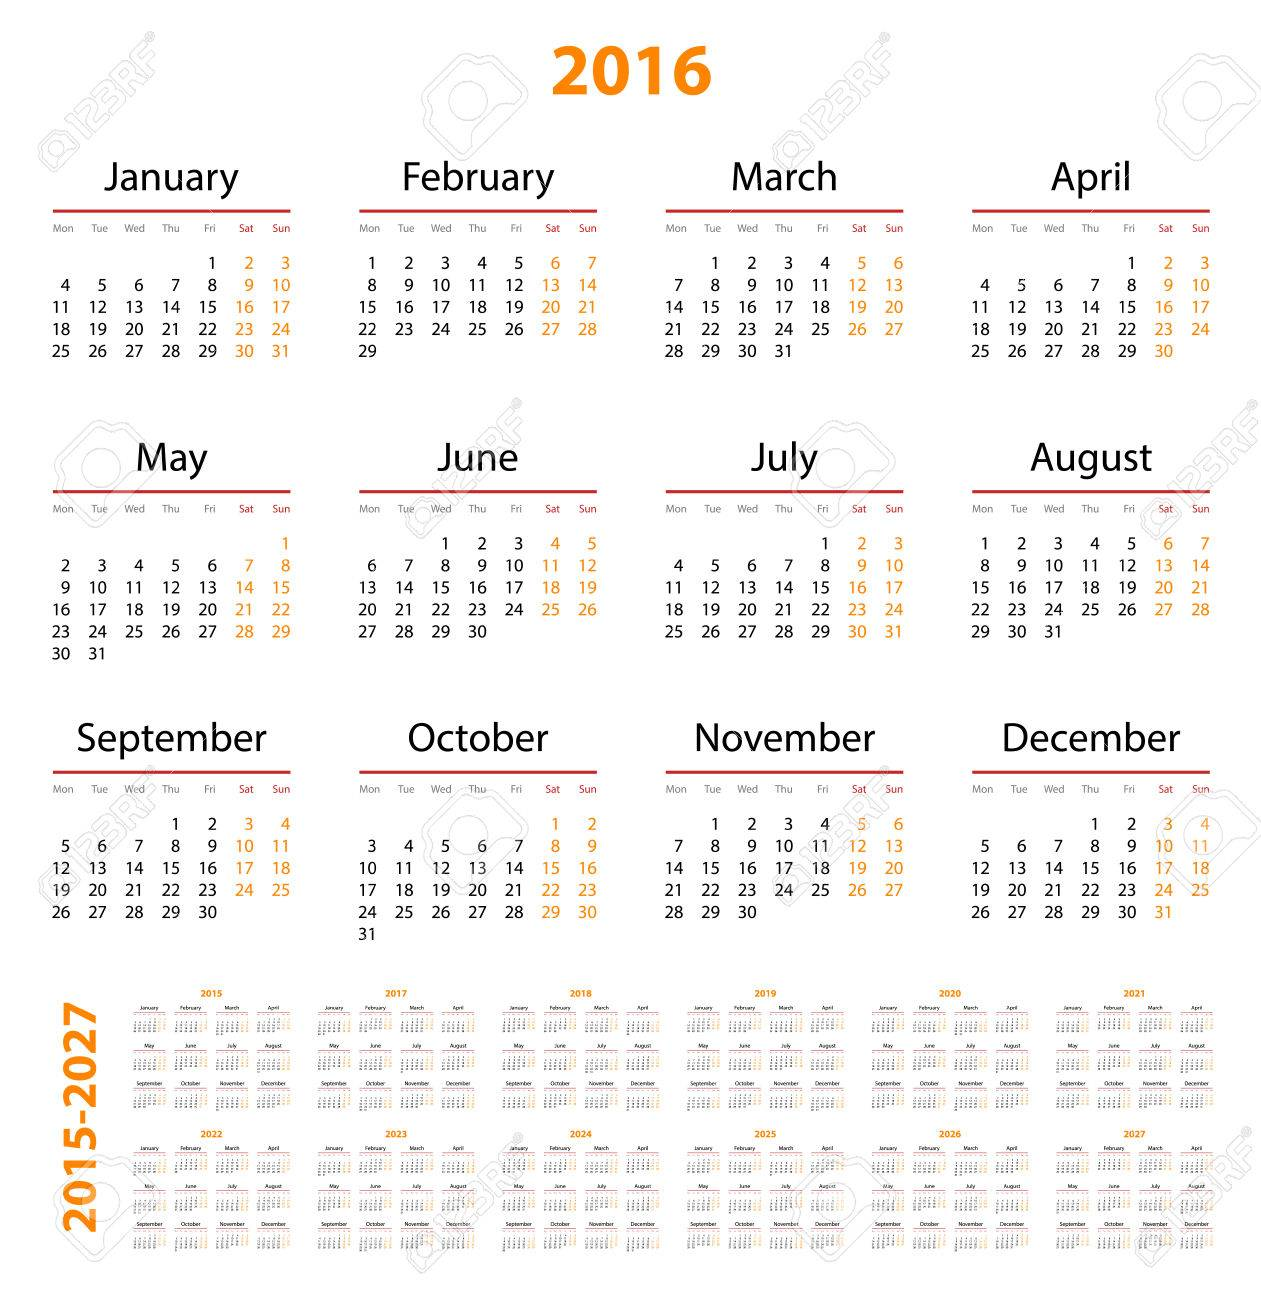 calendar 2015 2016 2017 2018 2019 2020 2021 2022